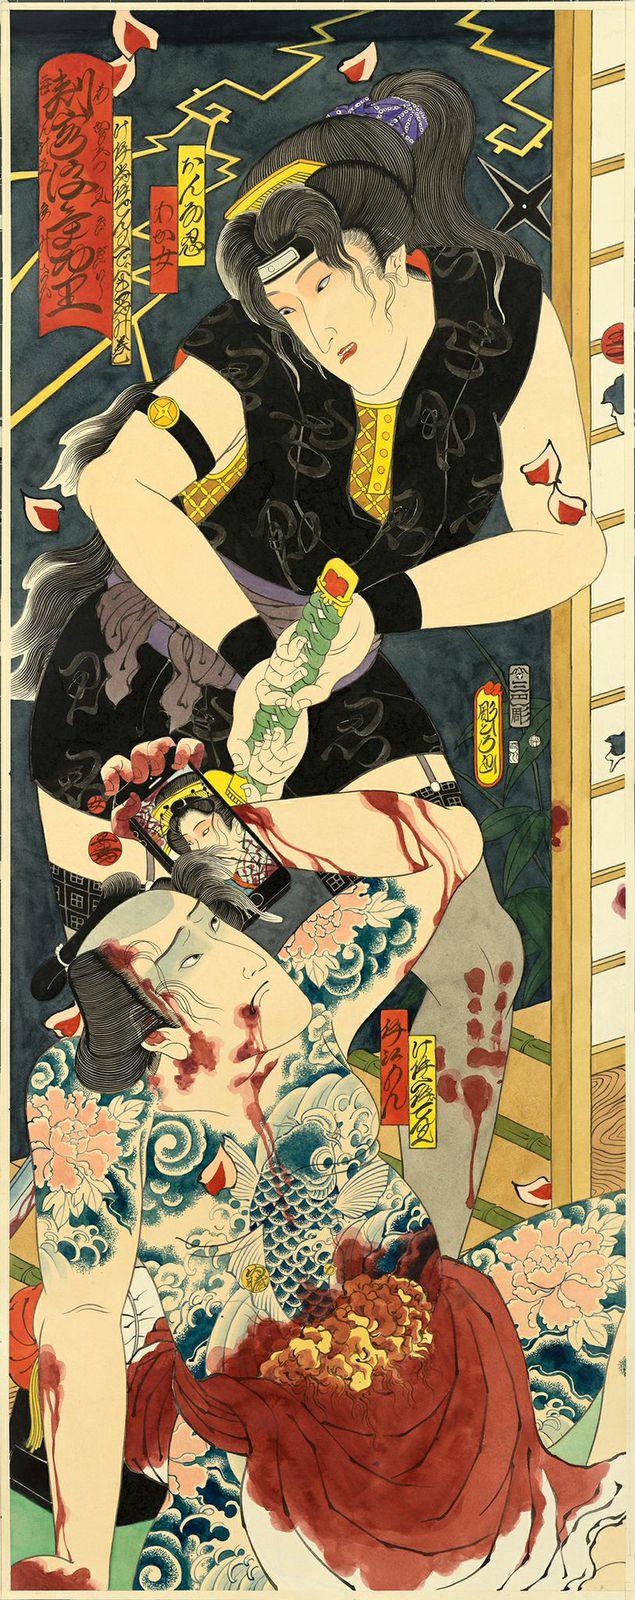 """Shikaku Uakigiri"" (Assassins Revenge) 13.5 in x 34.5 in. Limited Edition of 10"